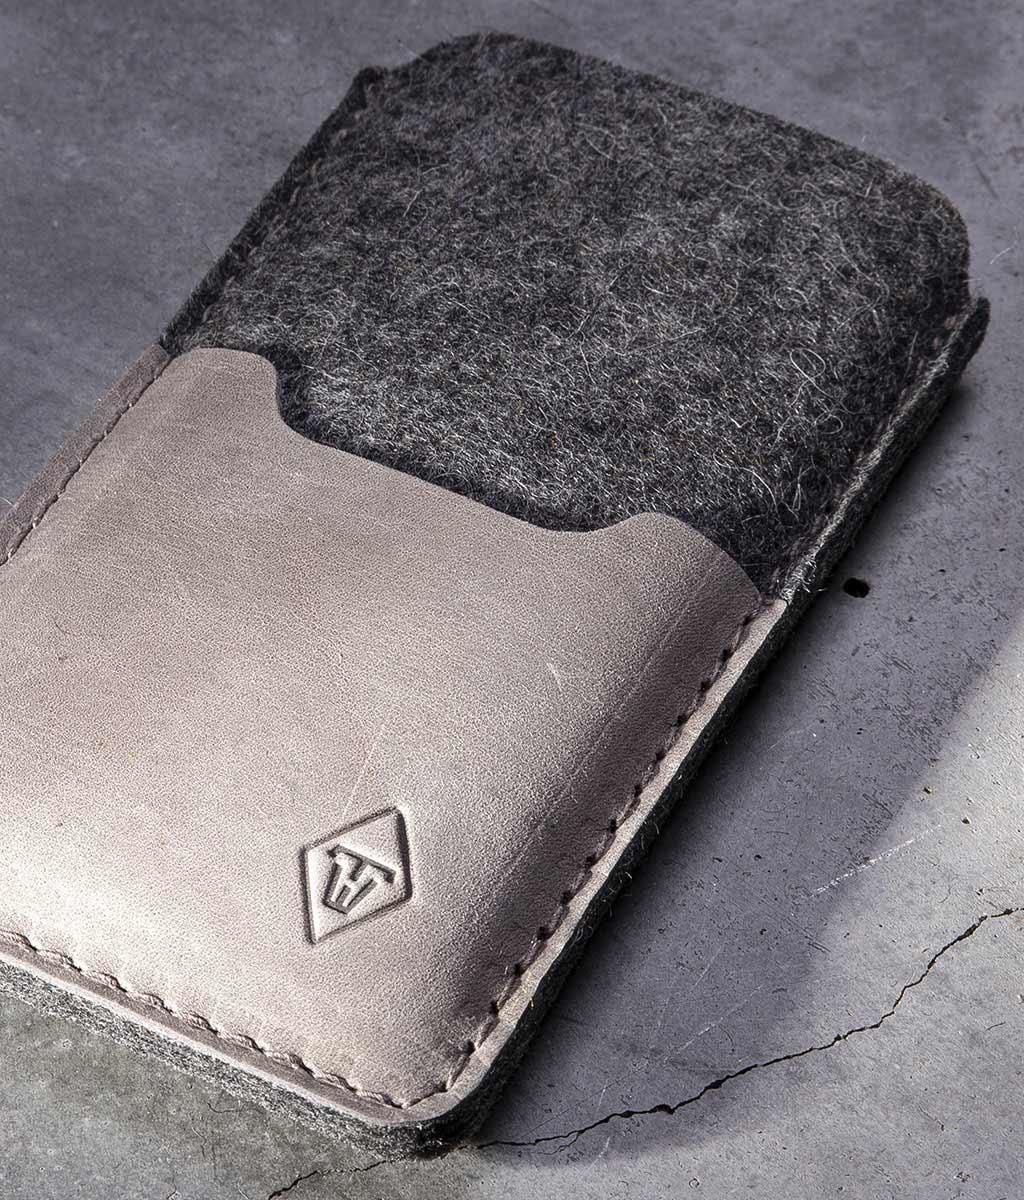 iPhone 13 12 11 Pro Max mini SE Filz Leder Tasche SMARTWERK